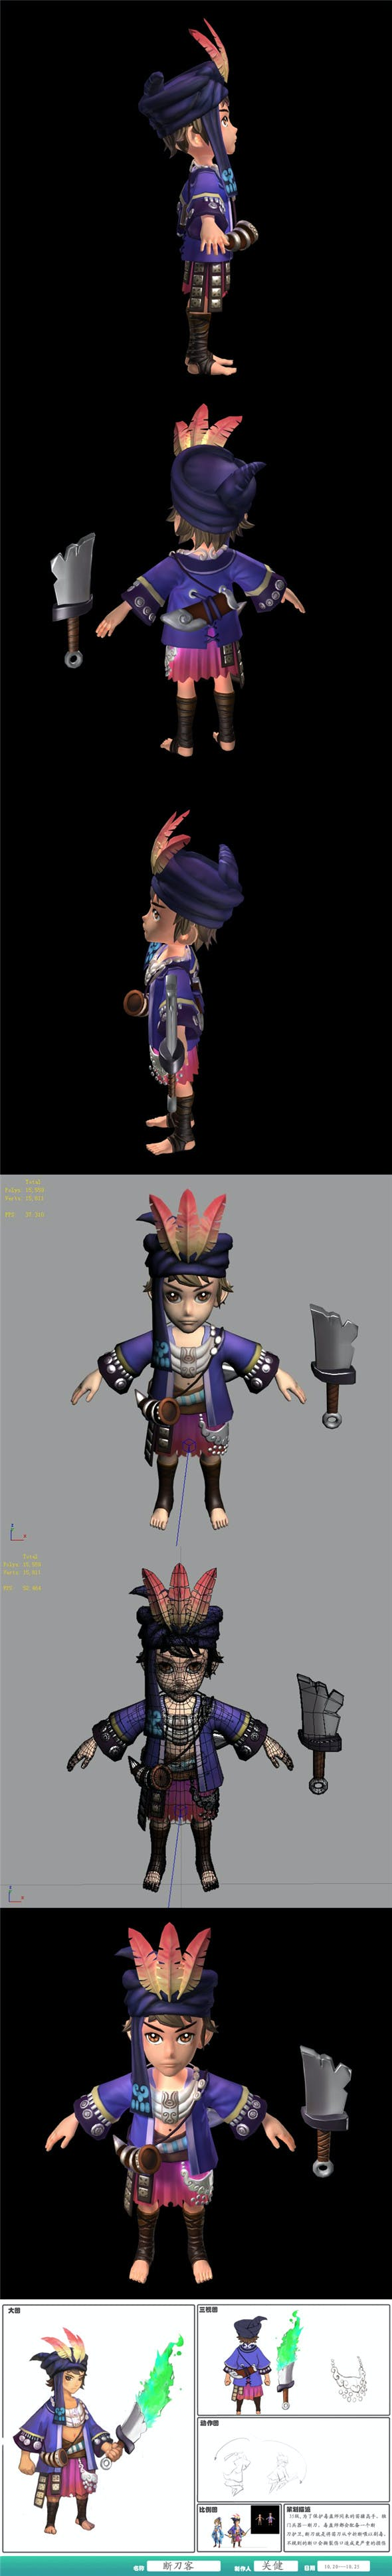 Game characters - Broken knife - 3DOcean Item for Sale